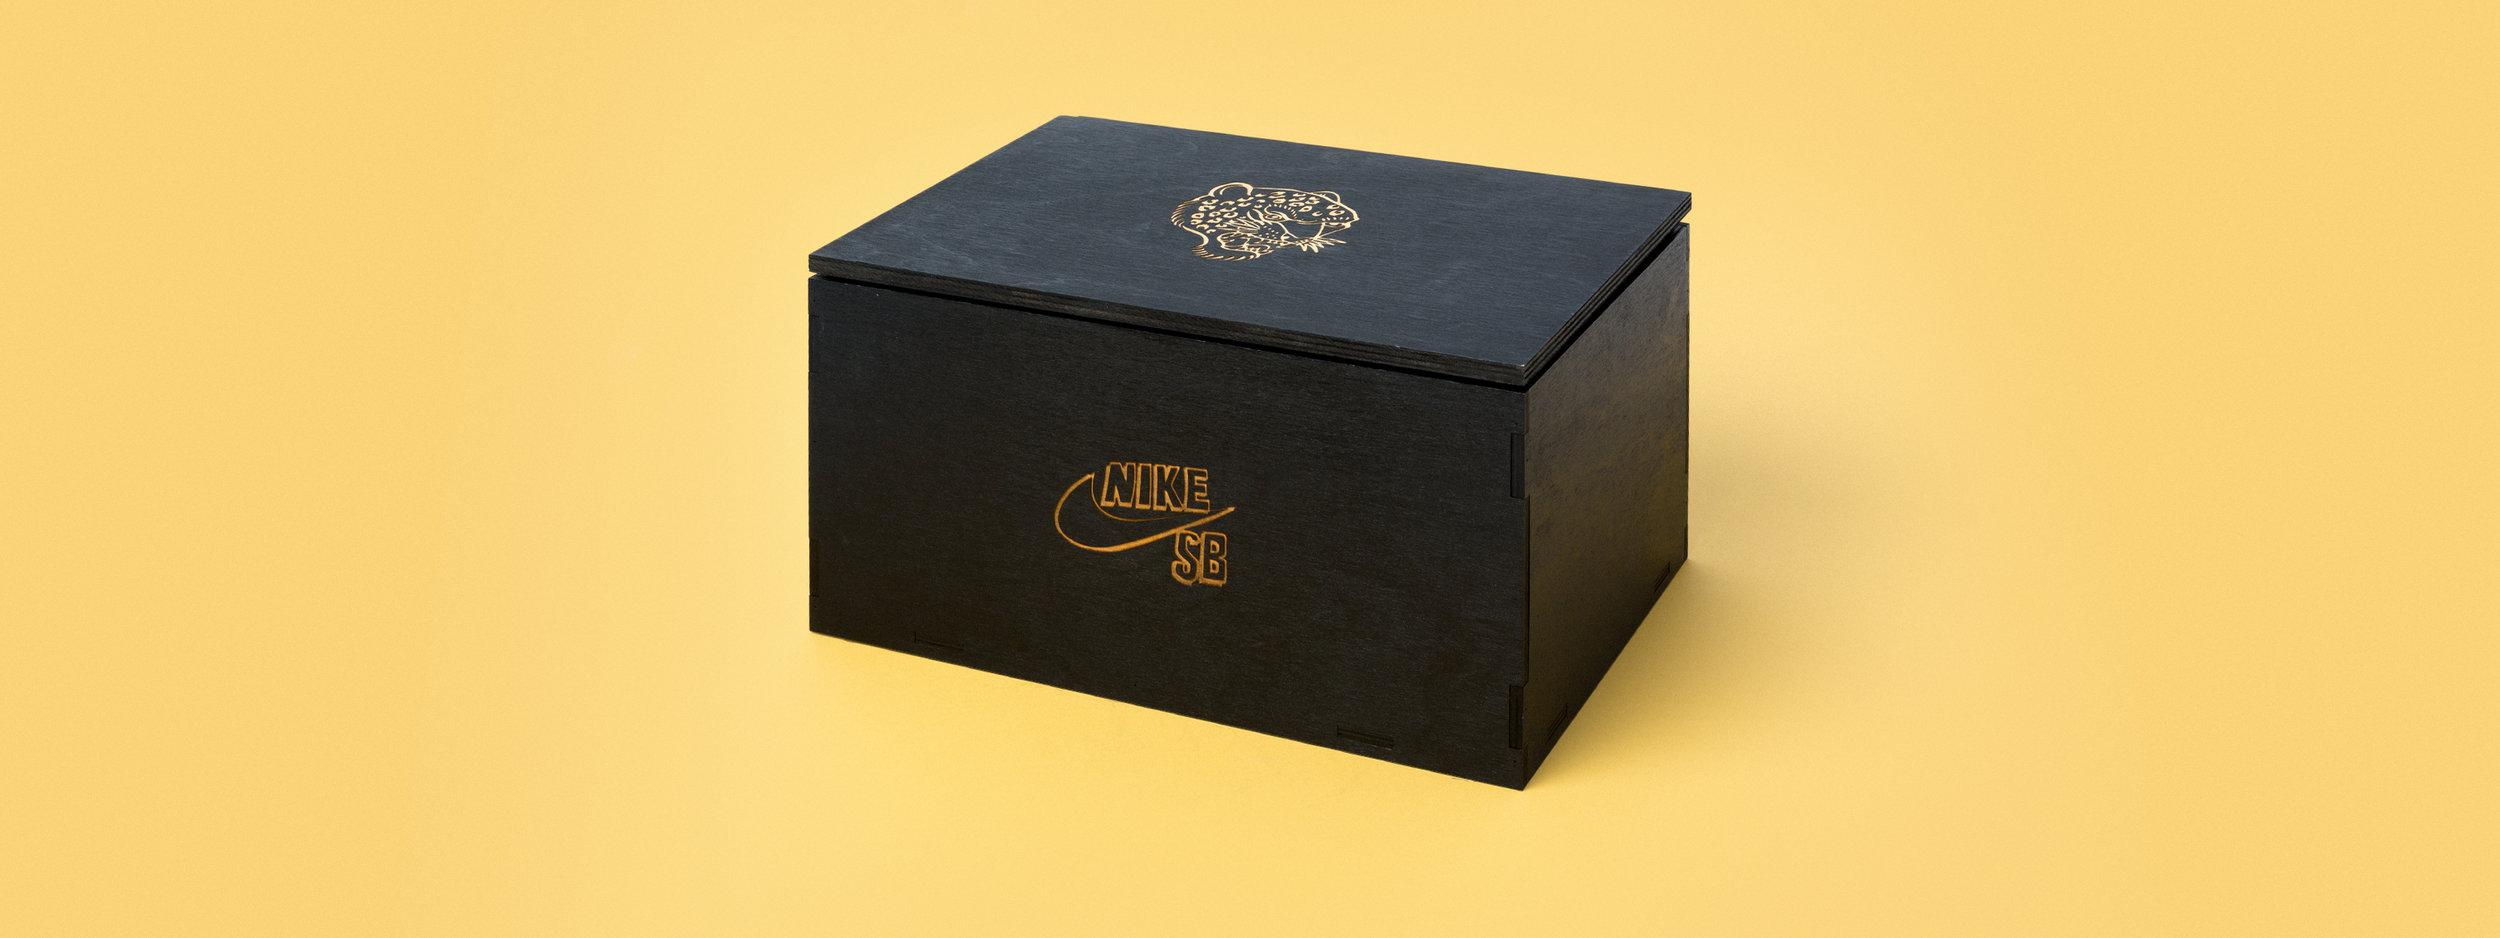 nike sb, brain anderson, seeding kit, shoe box, laser engraved acrylic, laser cut acrylic